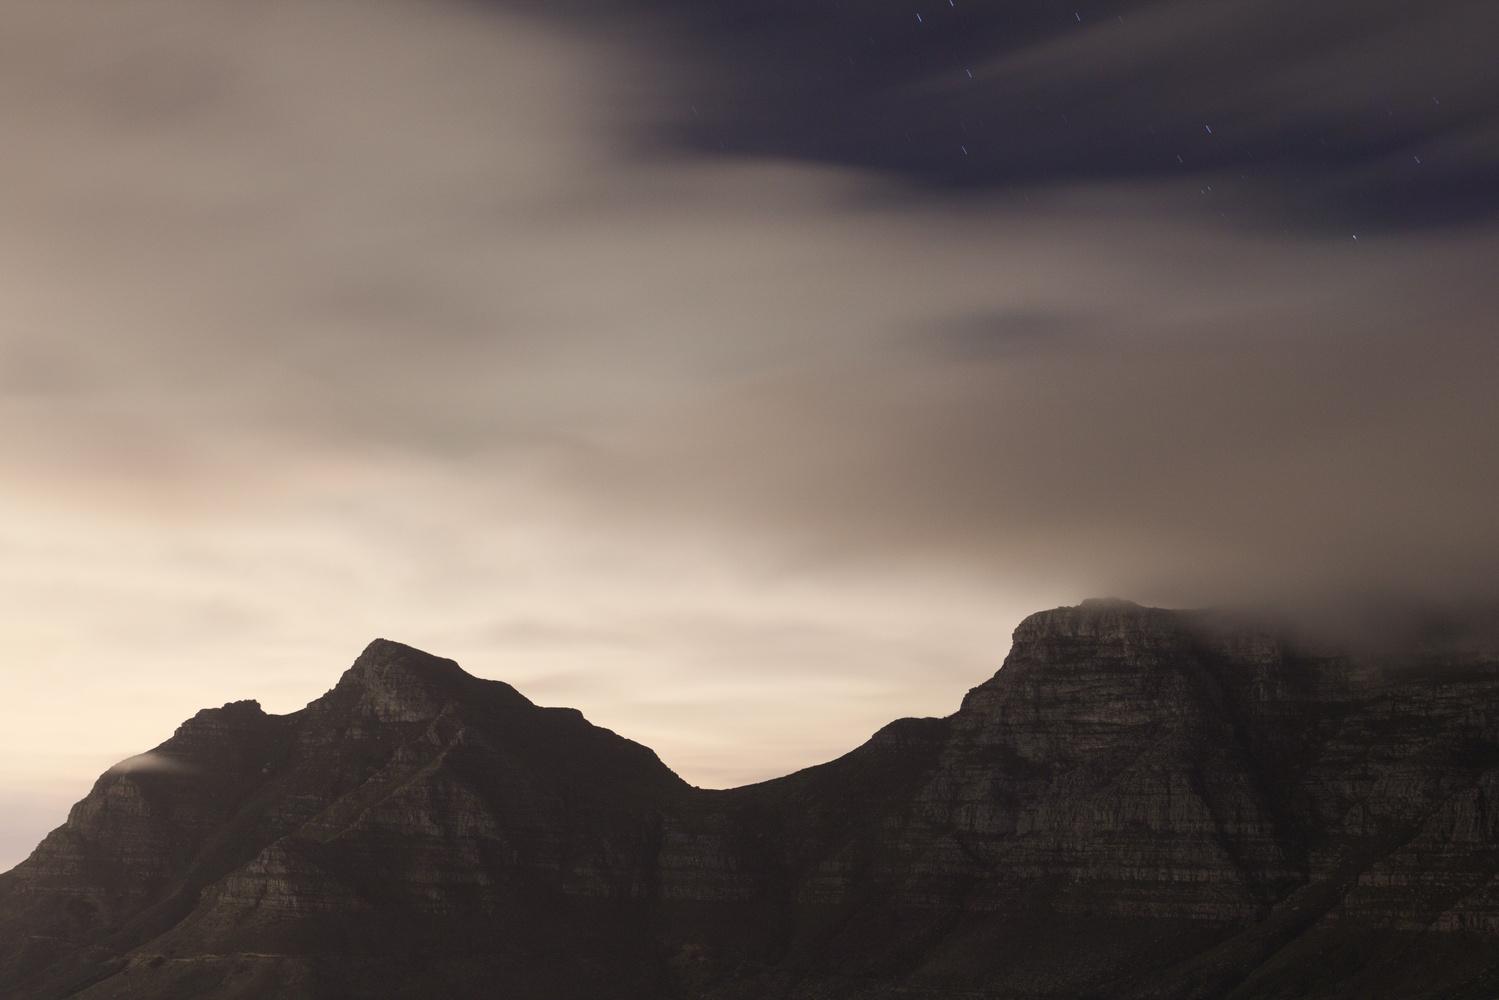 Devils Peak by Alex Sokolovs